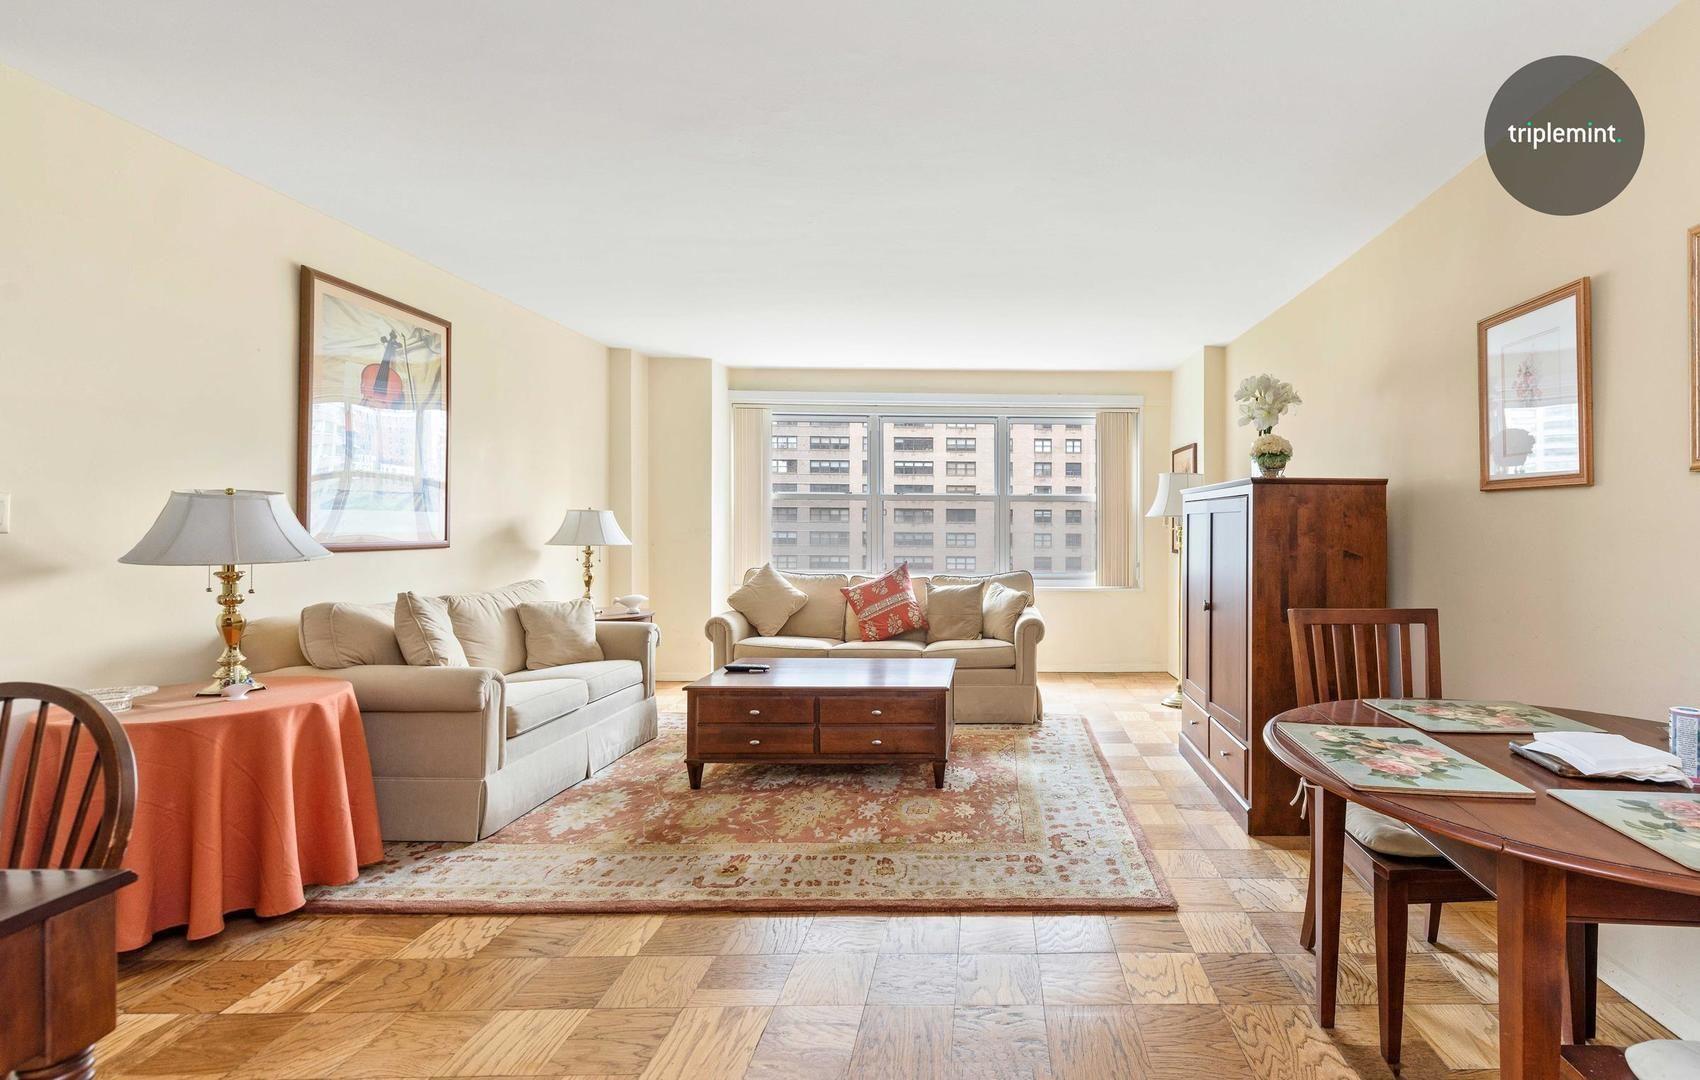 Apartment for sale at 150 West End Avenue, Apt 10-G